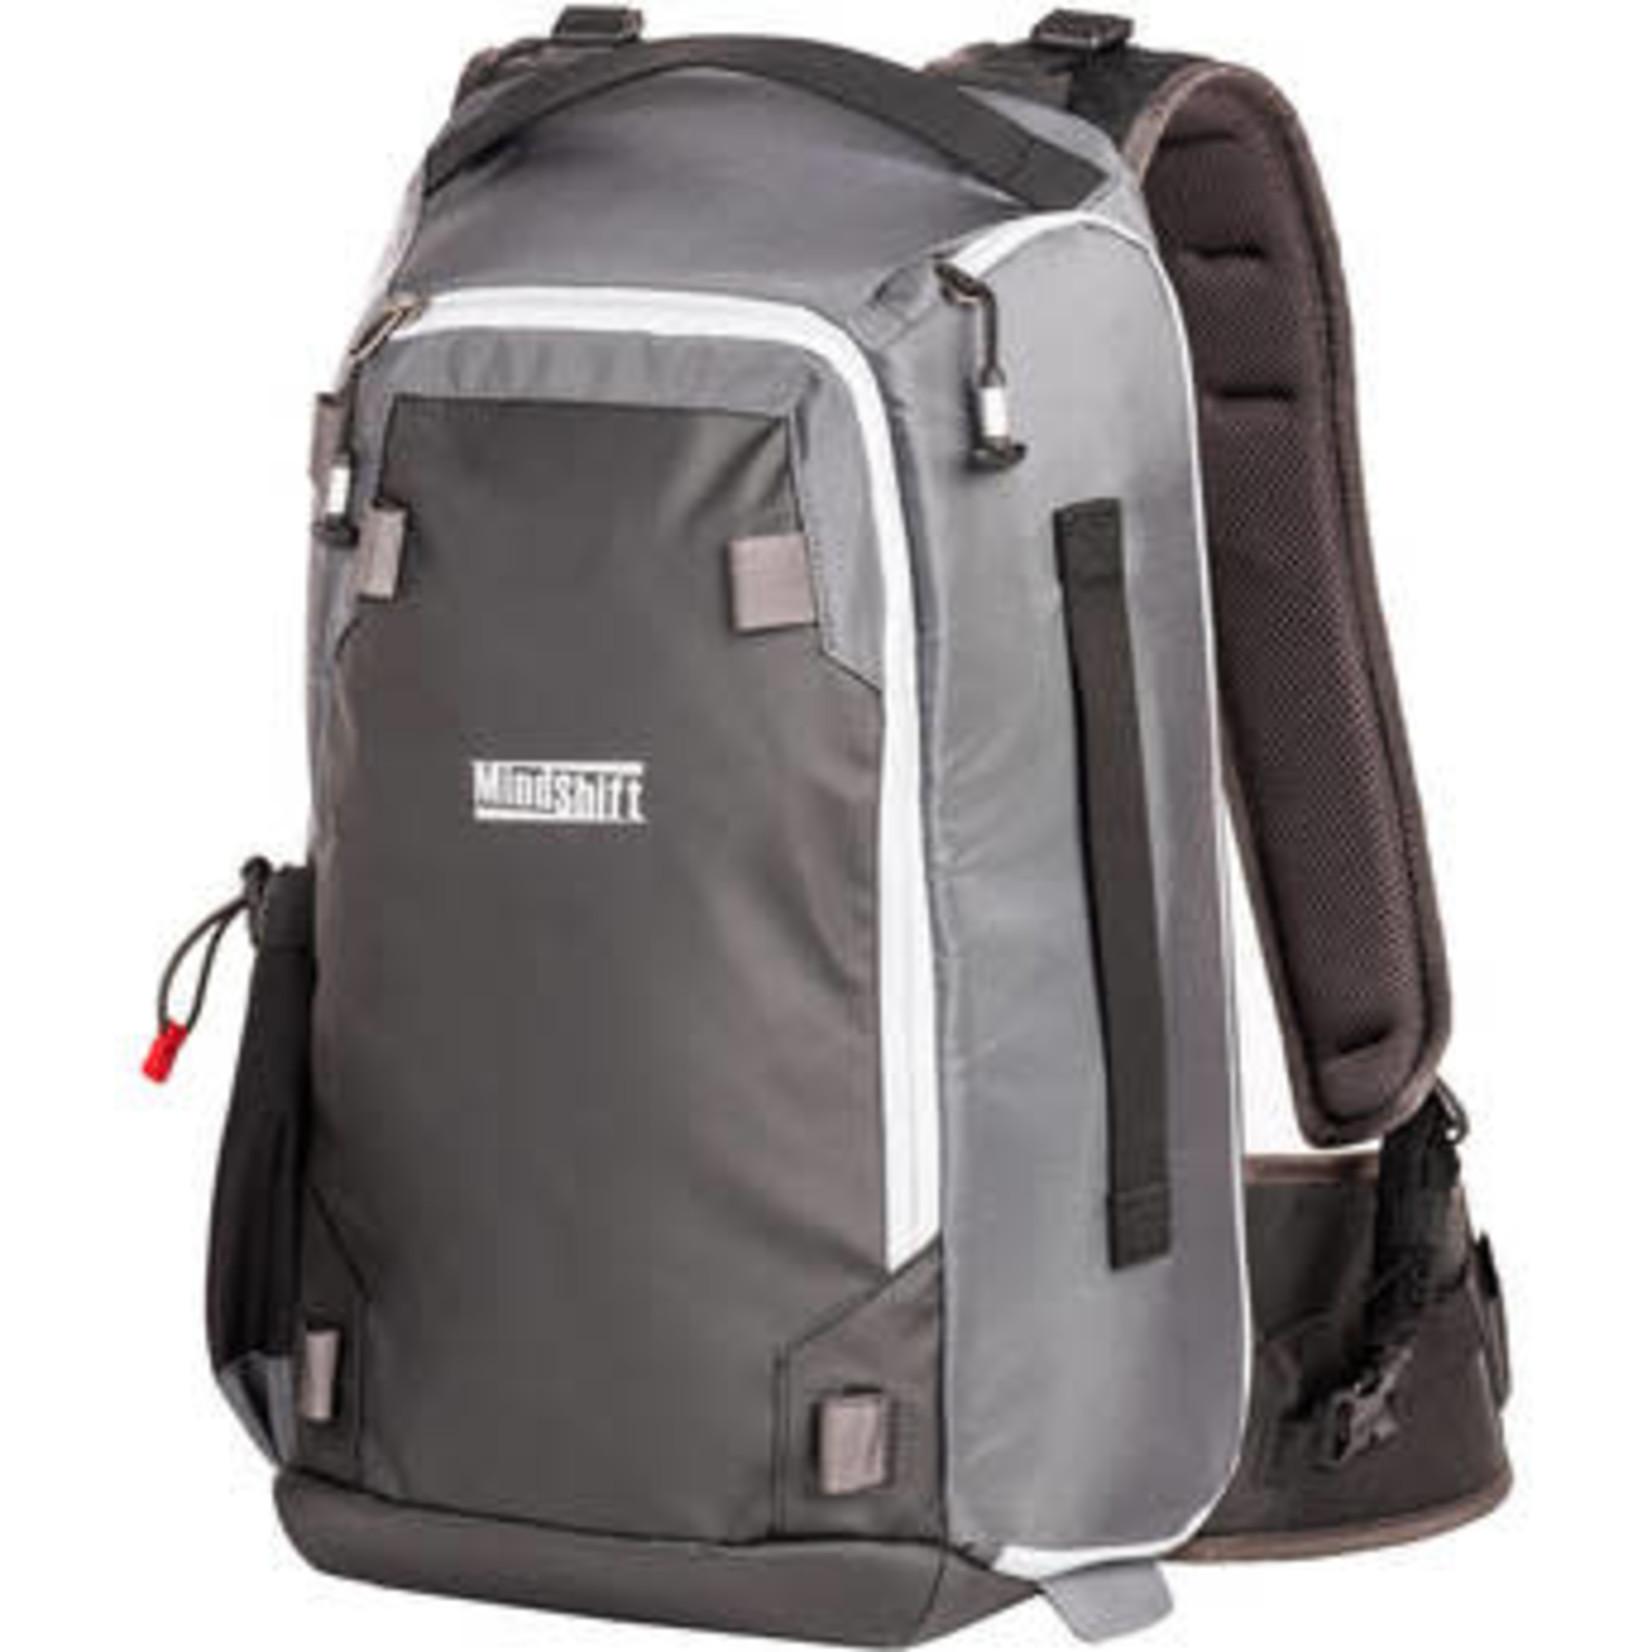 MindShift PhotoCross 13 Backpack - Carbon Grey